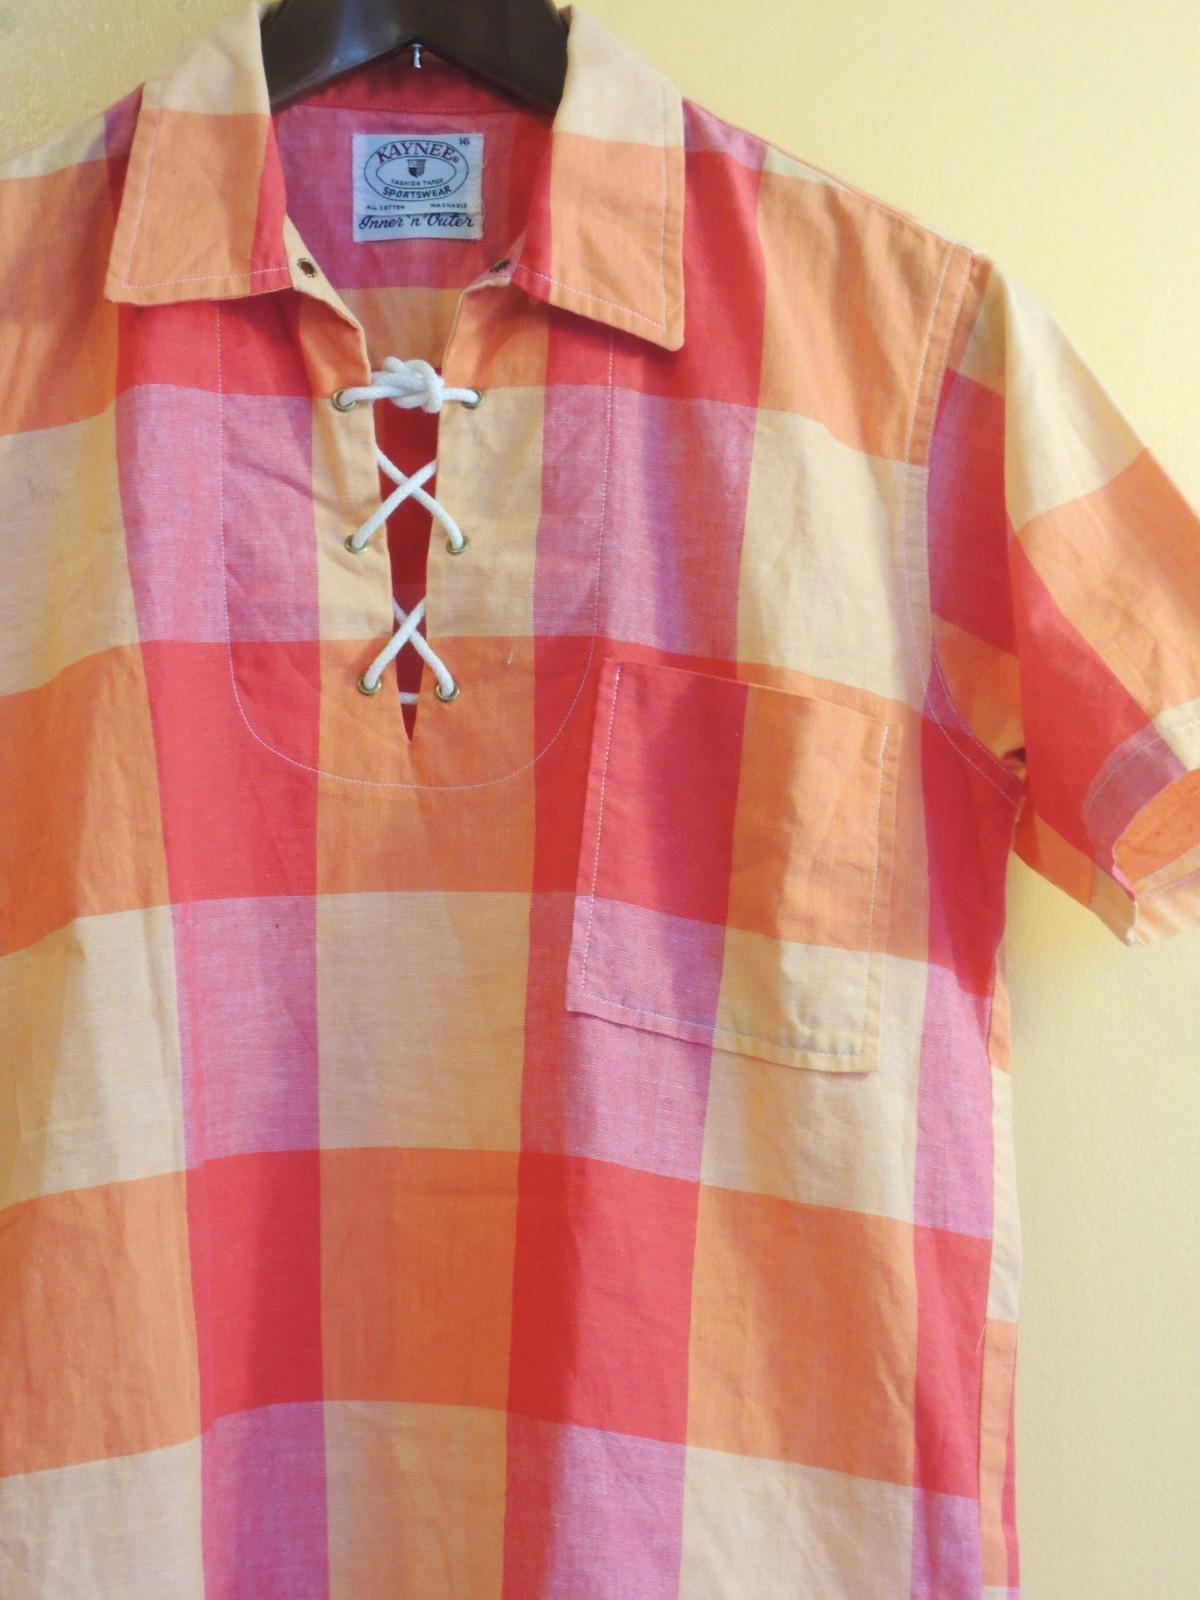 kayneeblockcheckshirts06.JPG